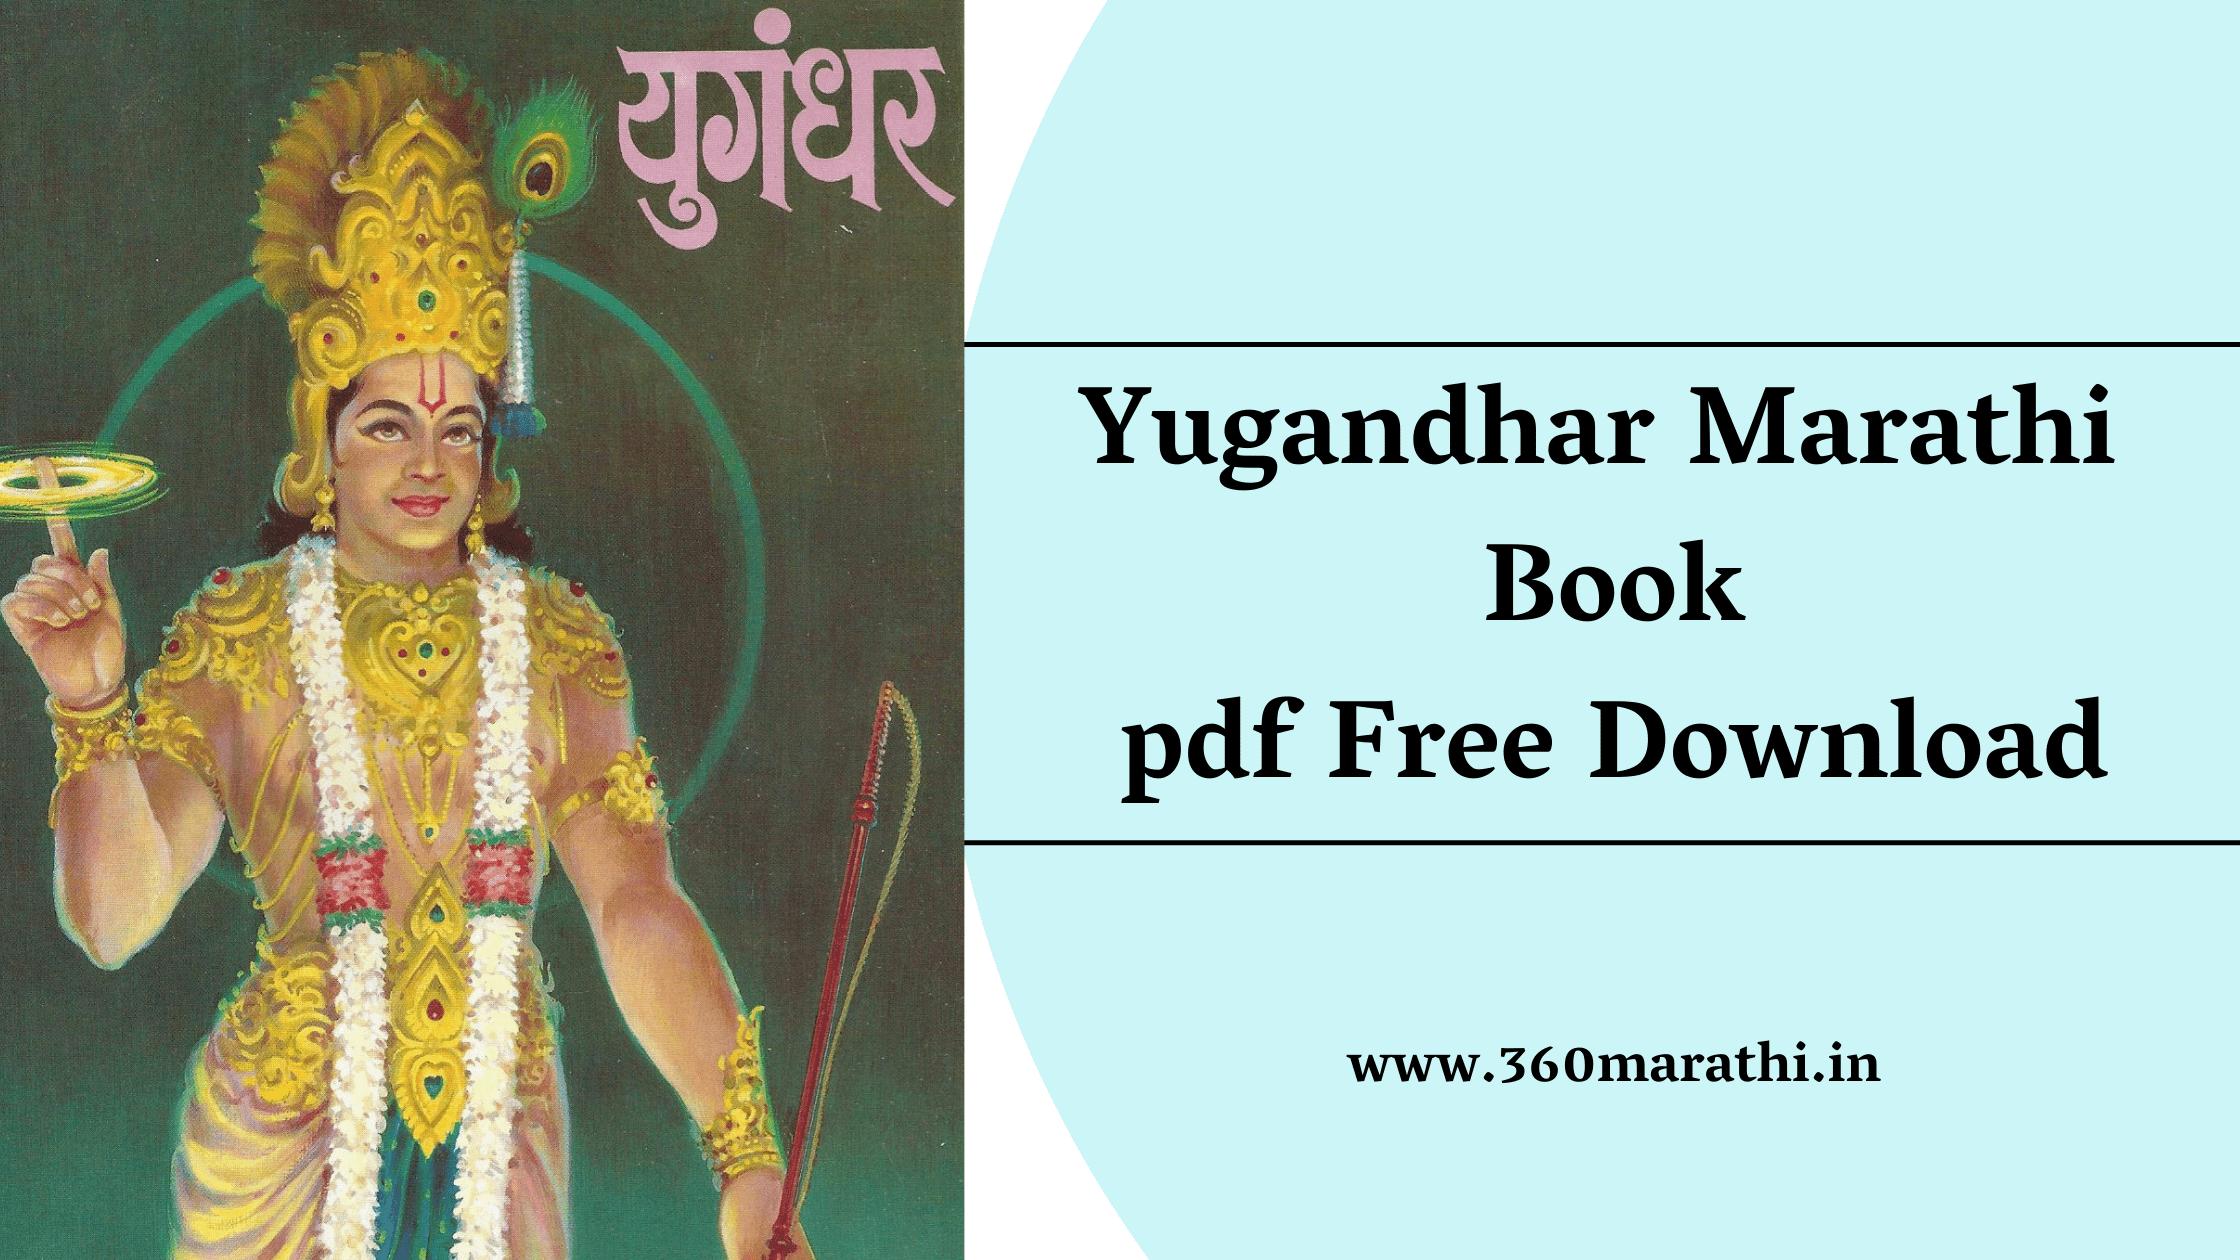 【Free】Yugandhar Marathi Book pdf Free Download | युगंधर कादंबरी Shivaji Sawant pdf Download